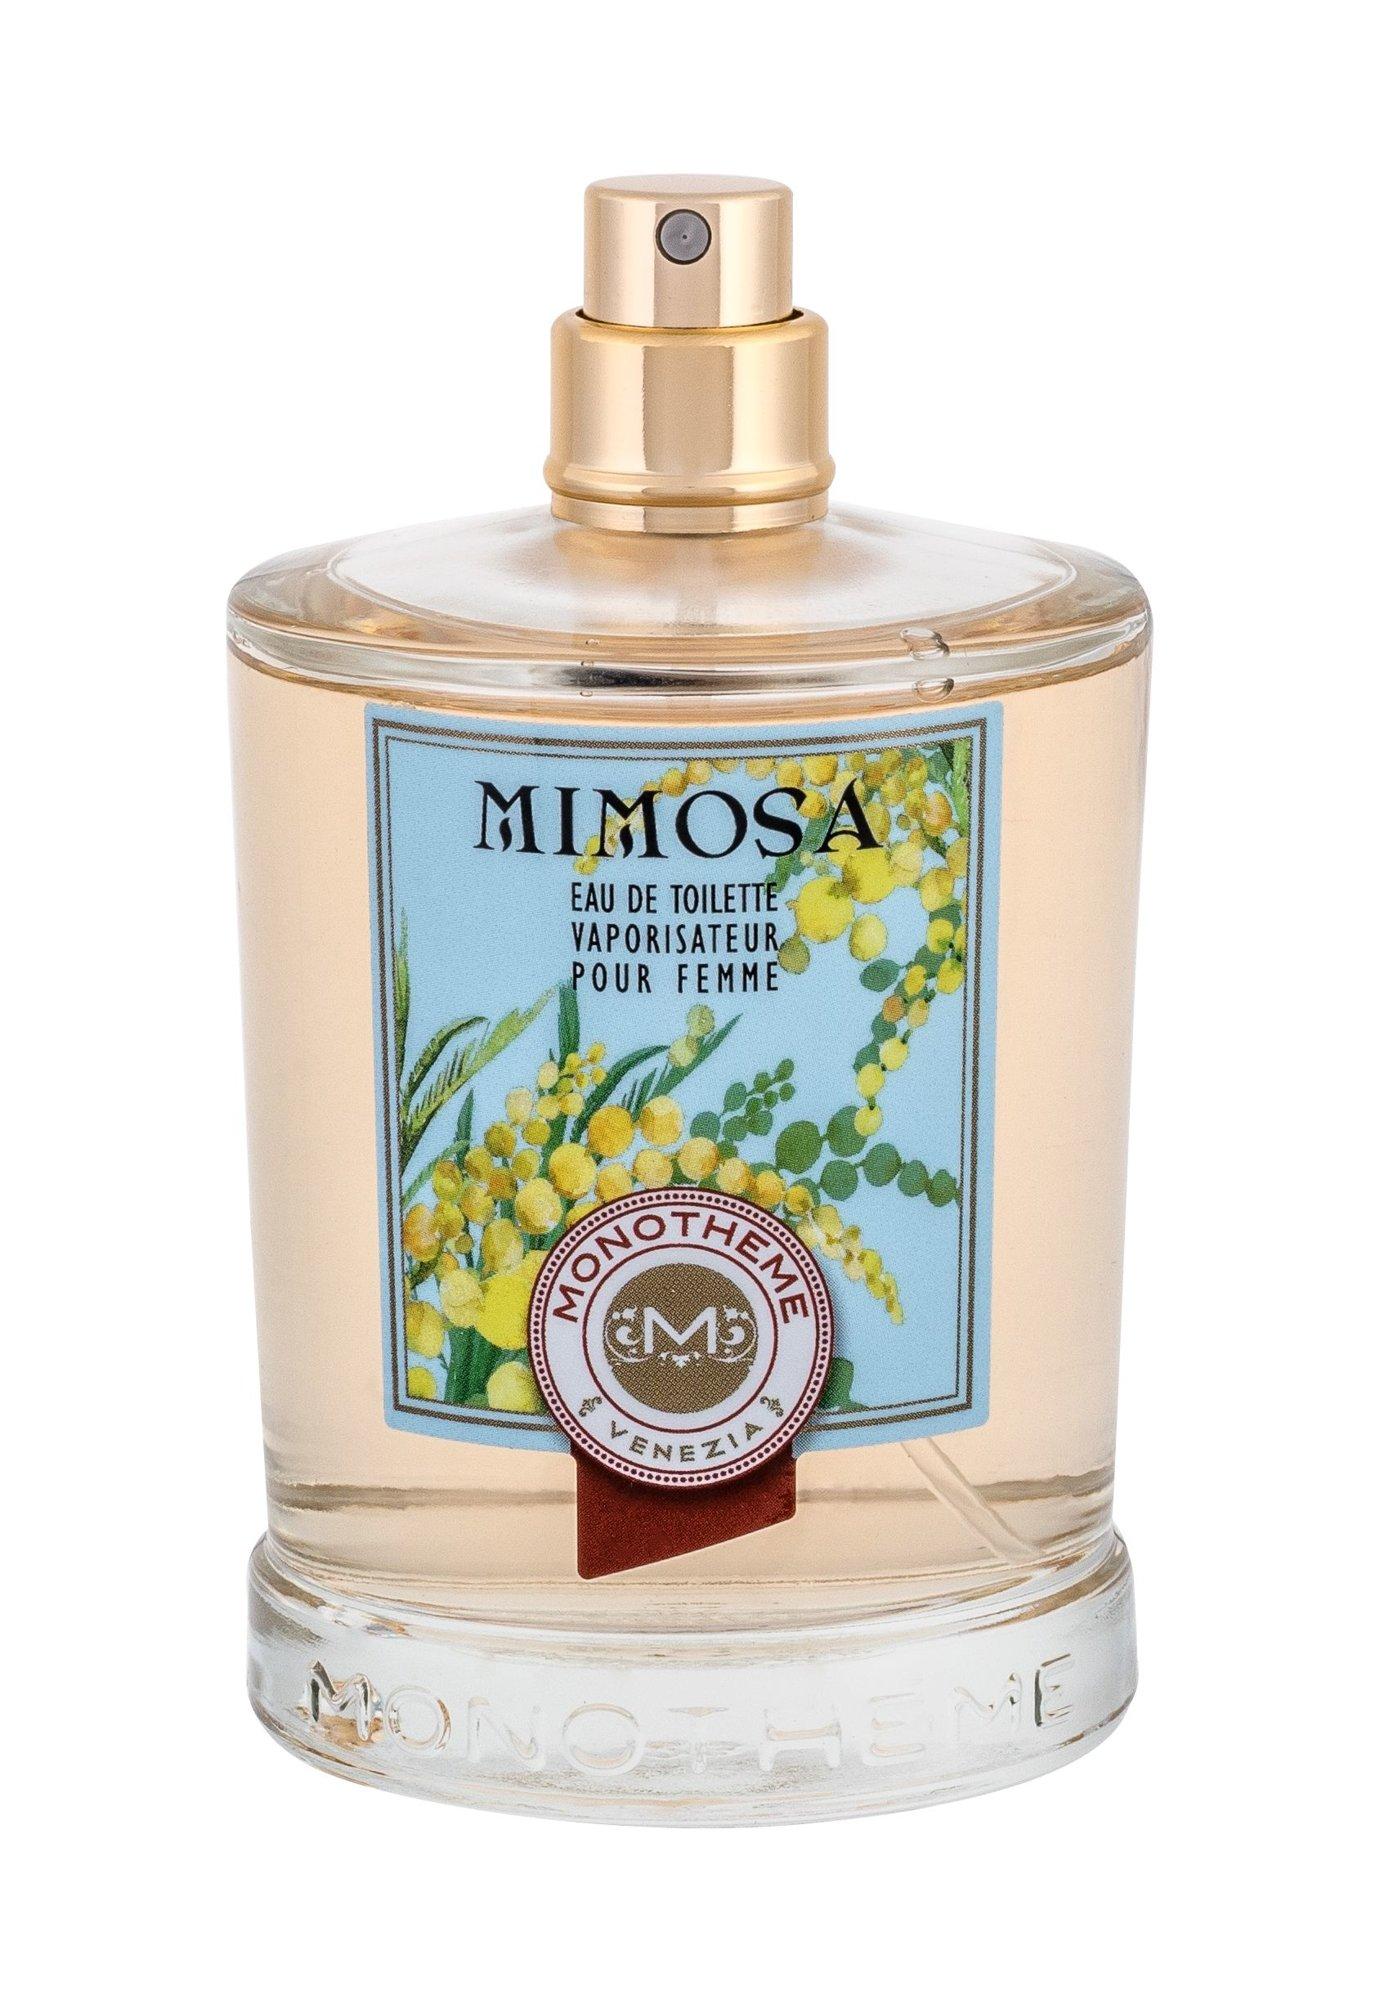 Monotheme Venezia Mimosa Eau de Toilette 100ml